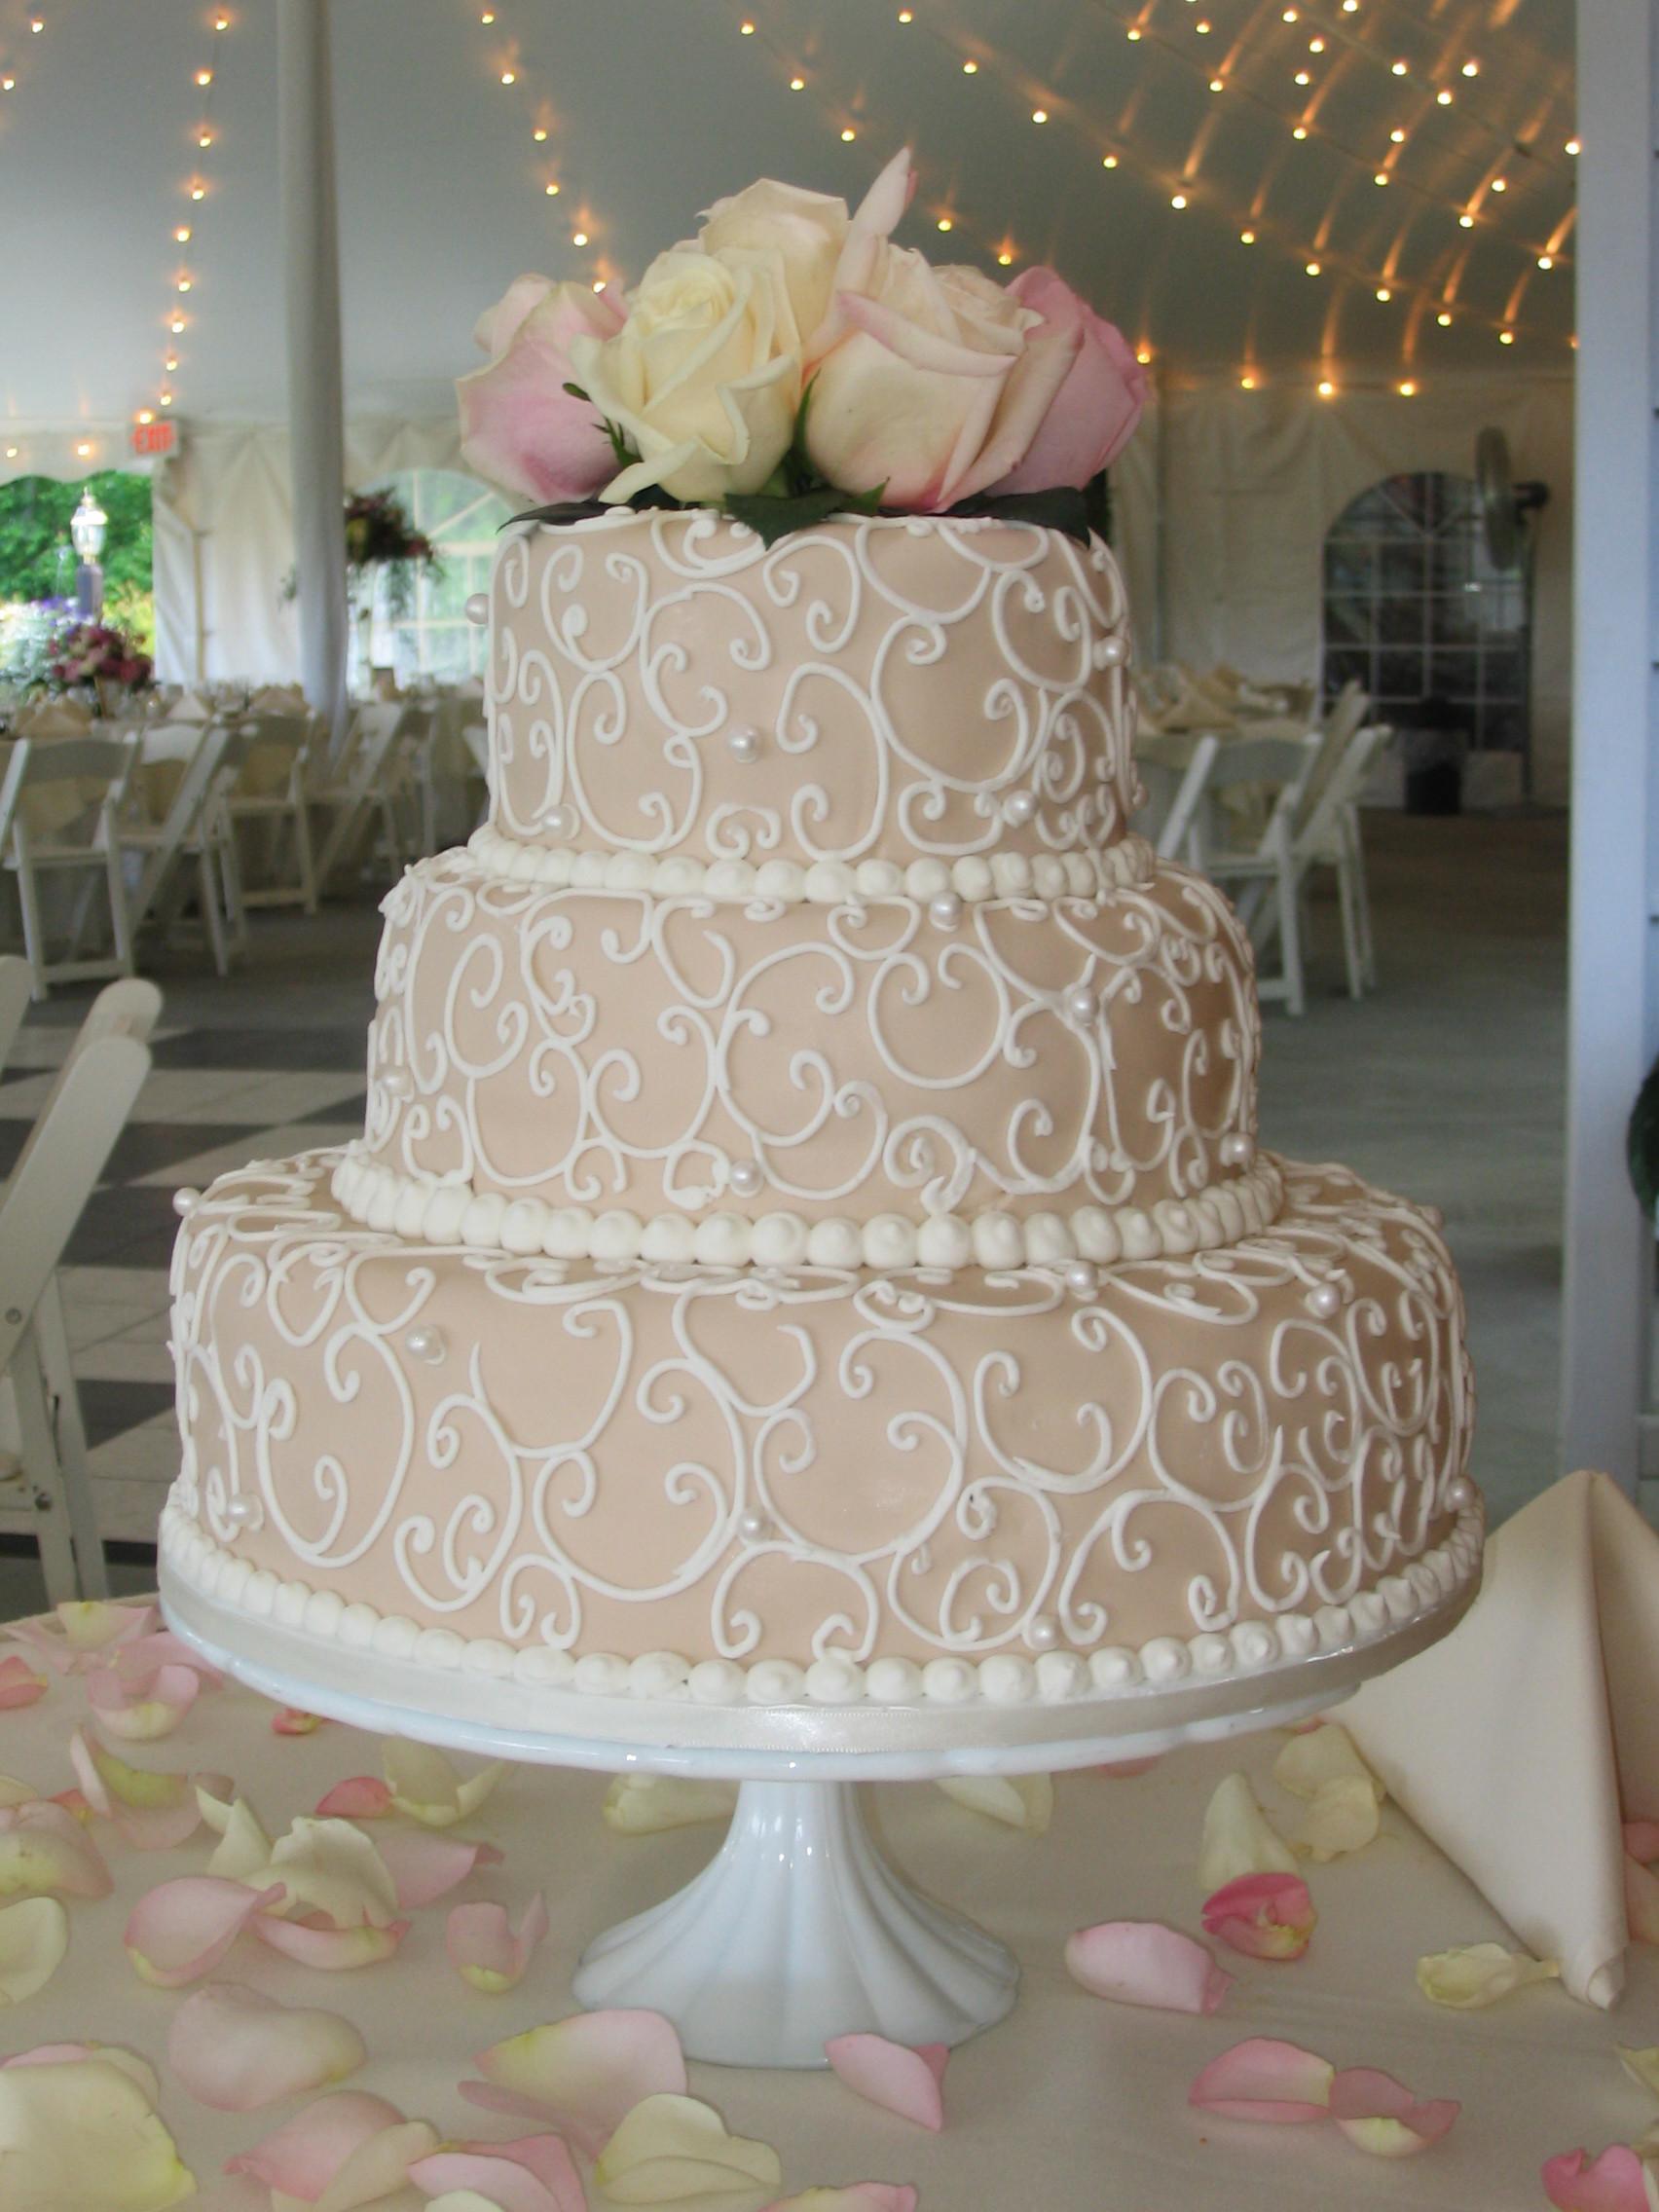 Wedding Cakes Massachusetts  Wedding cakes worcester ma idea in 2017